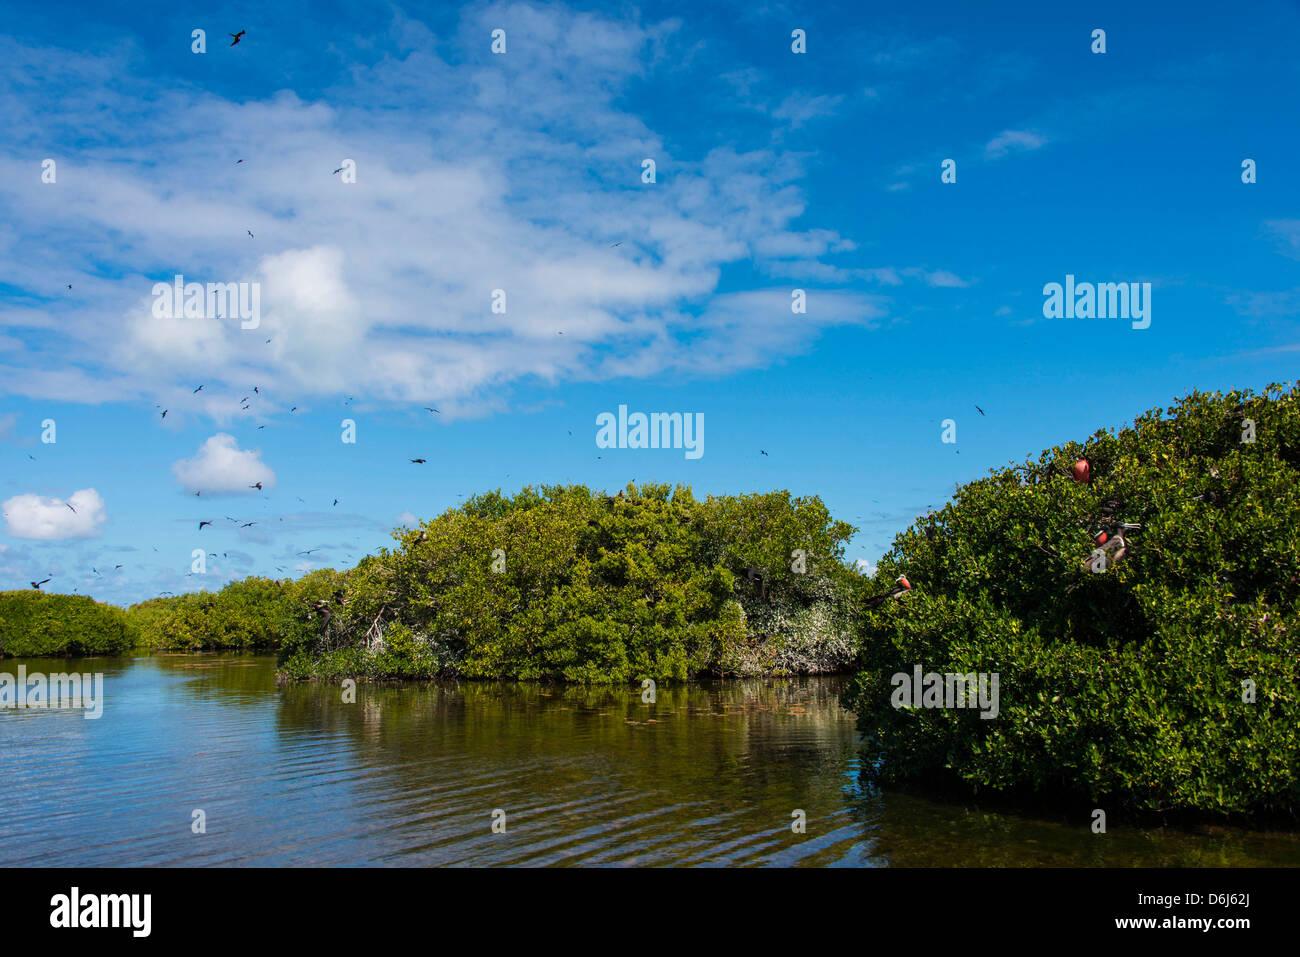 Frigate bird colony in the Codrington lagoon, Barbuda, Antigua and Barbuda, West Indies, Caribbean, Central America - Stock Image